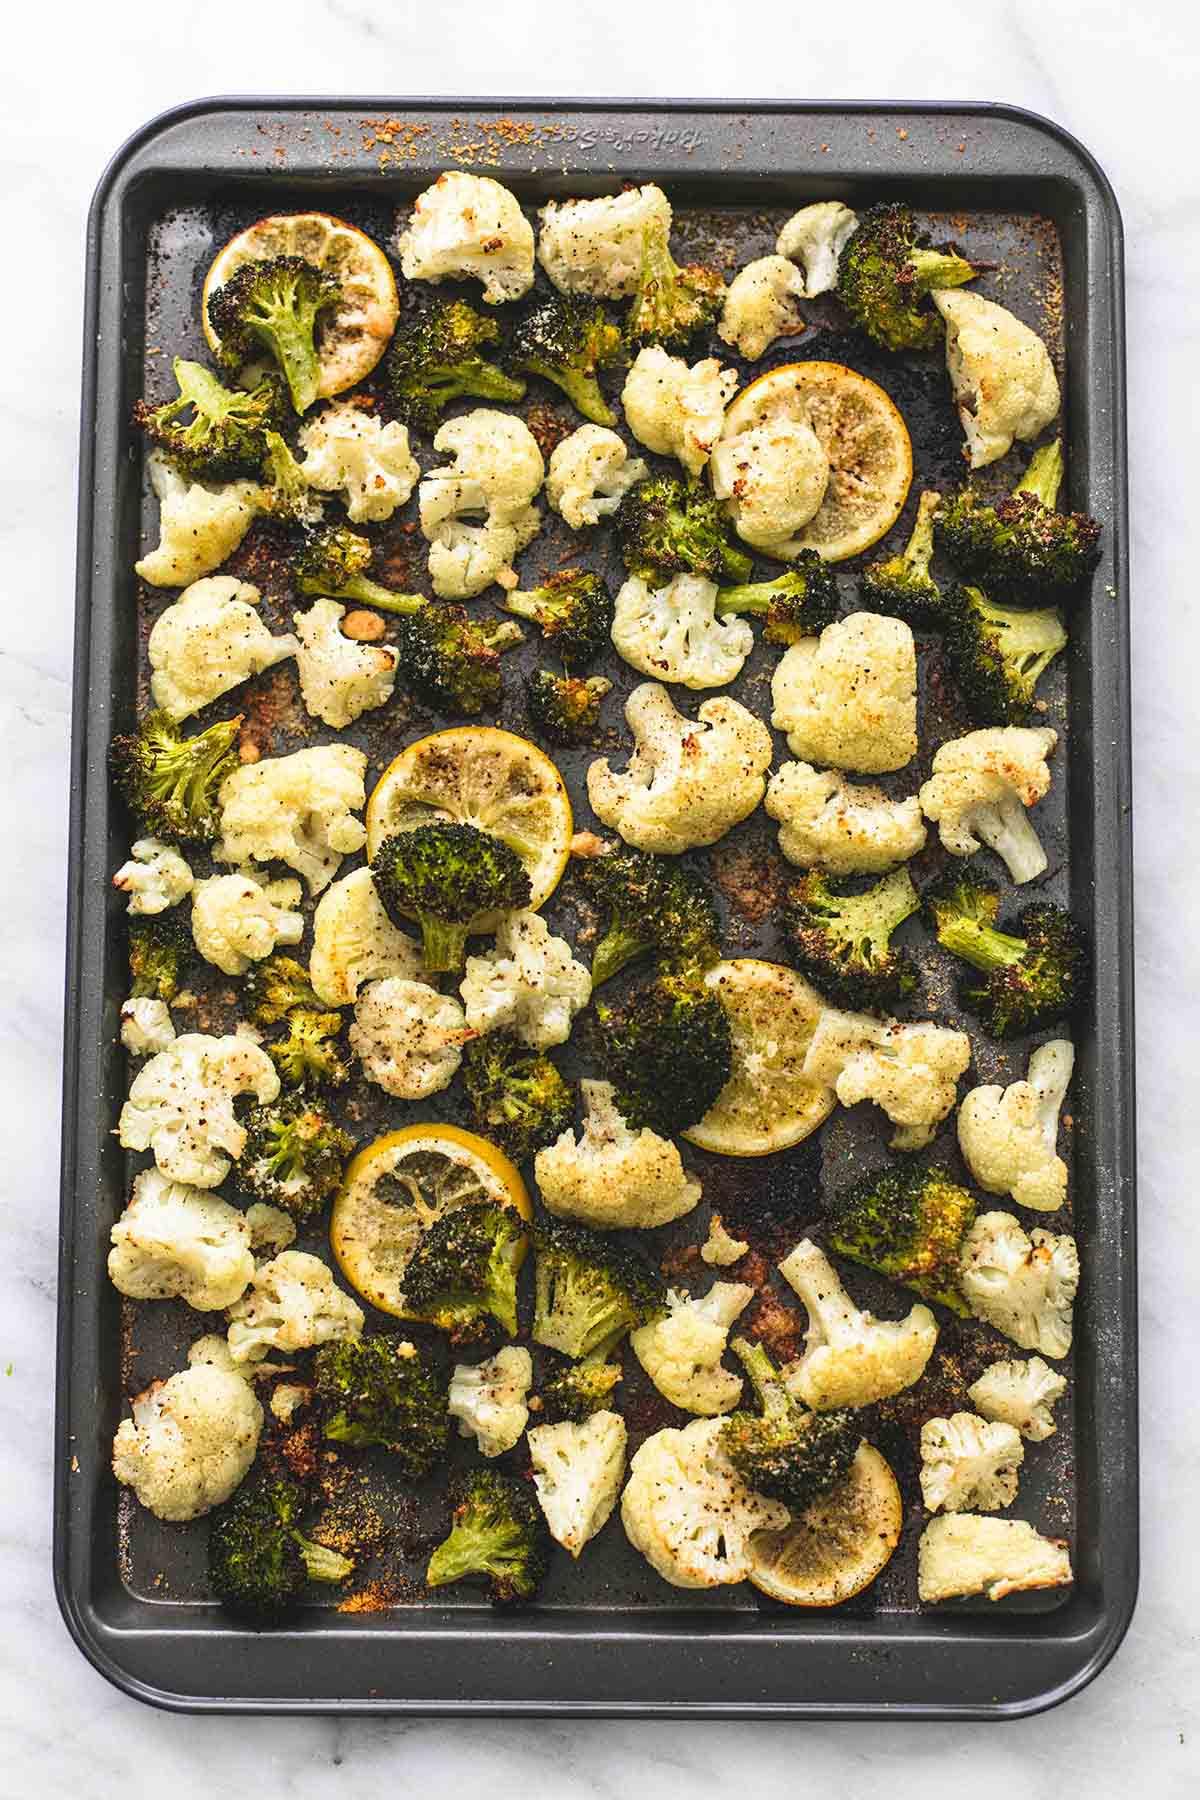 top view of roasted lemon garlic broccoli & cauliflower on a baking sheet.